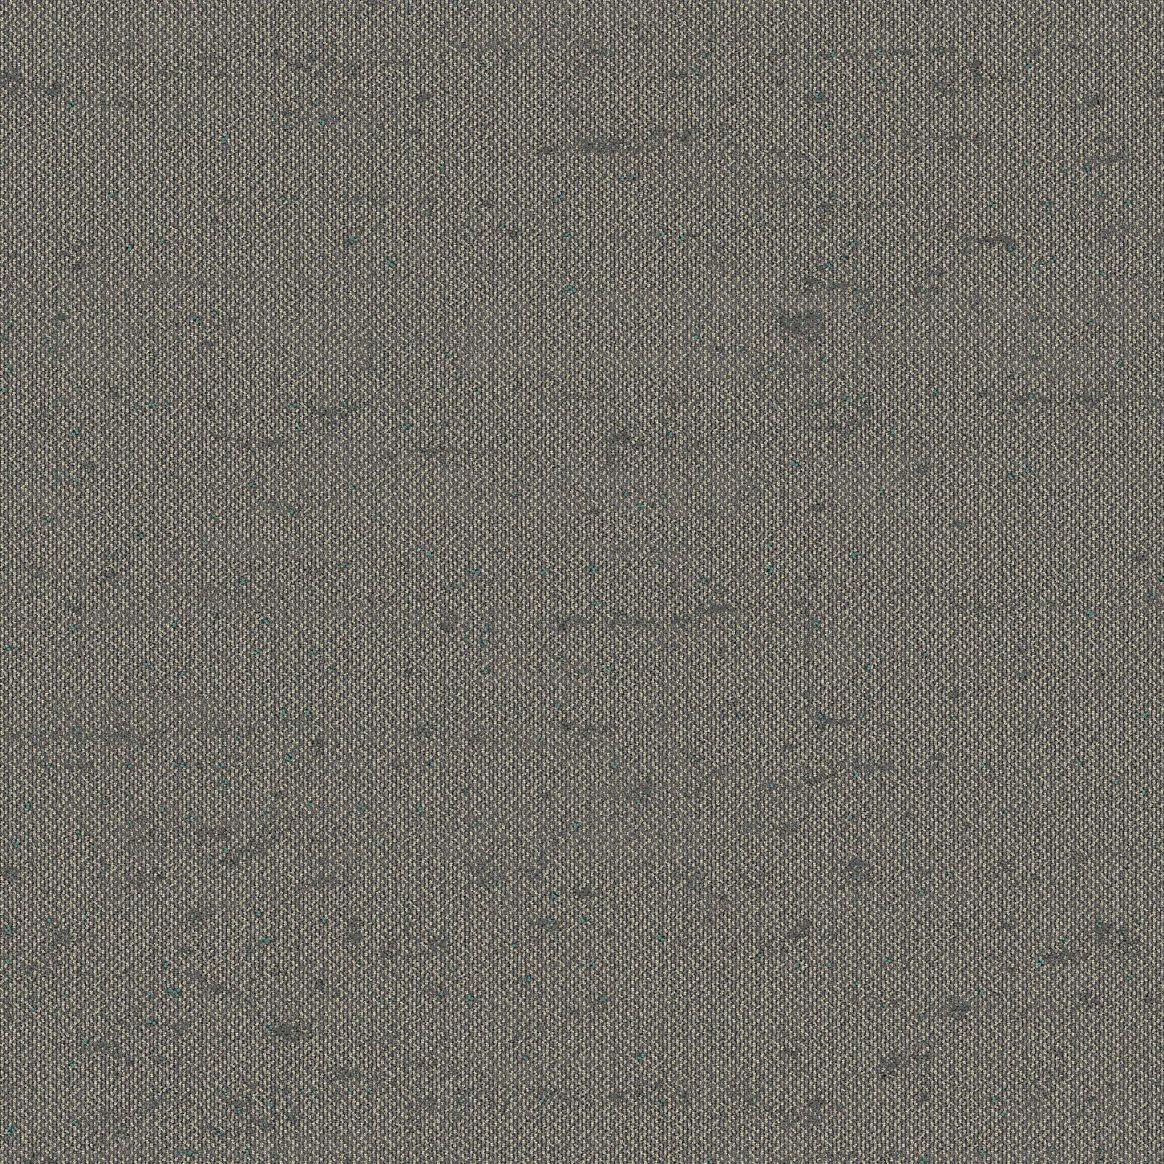 Oxidize thumbnail